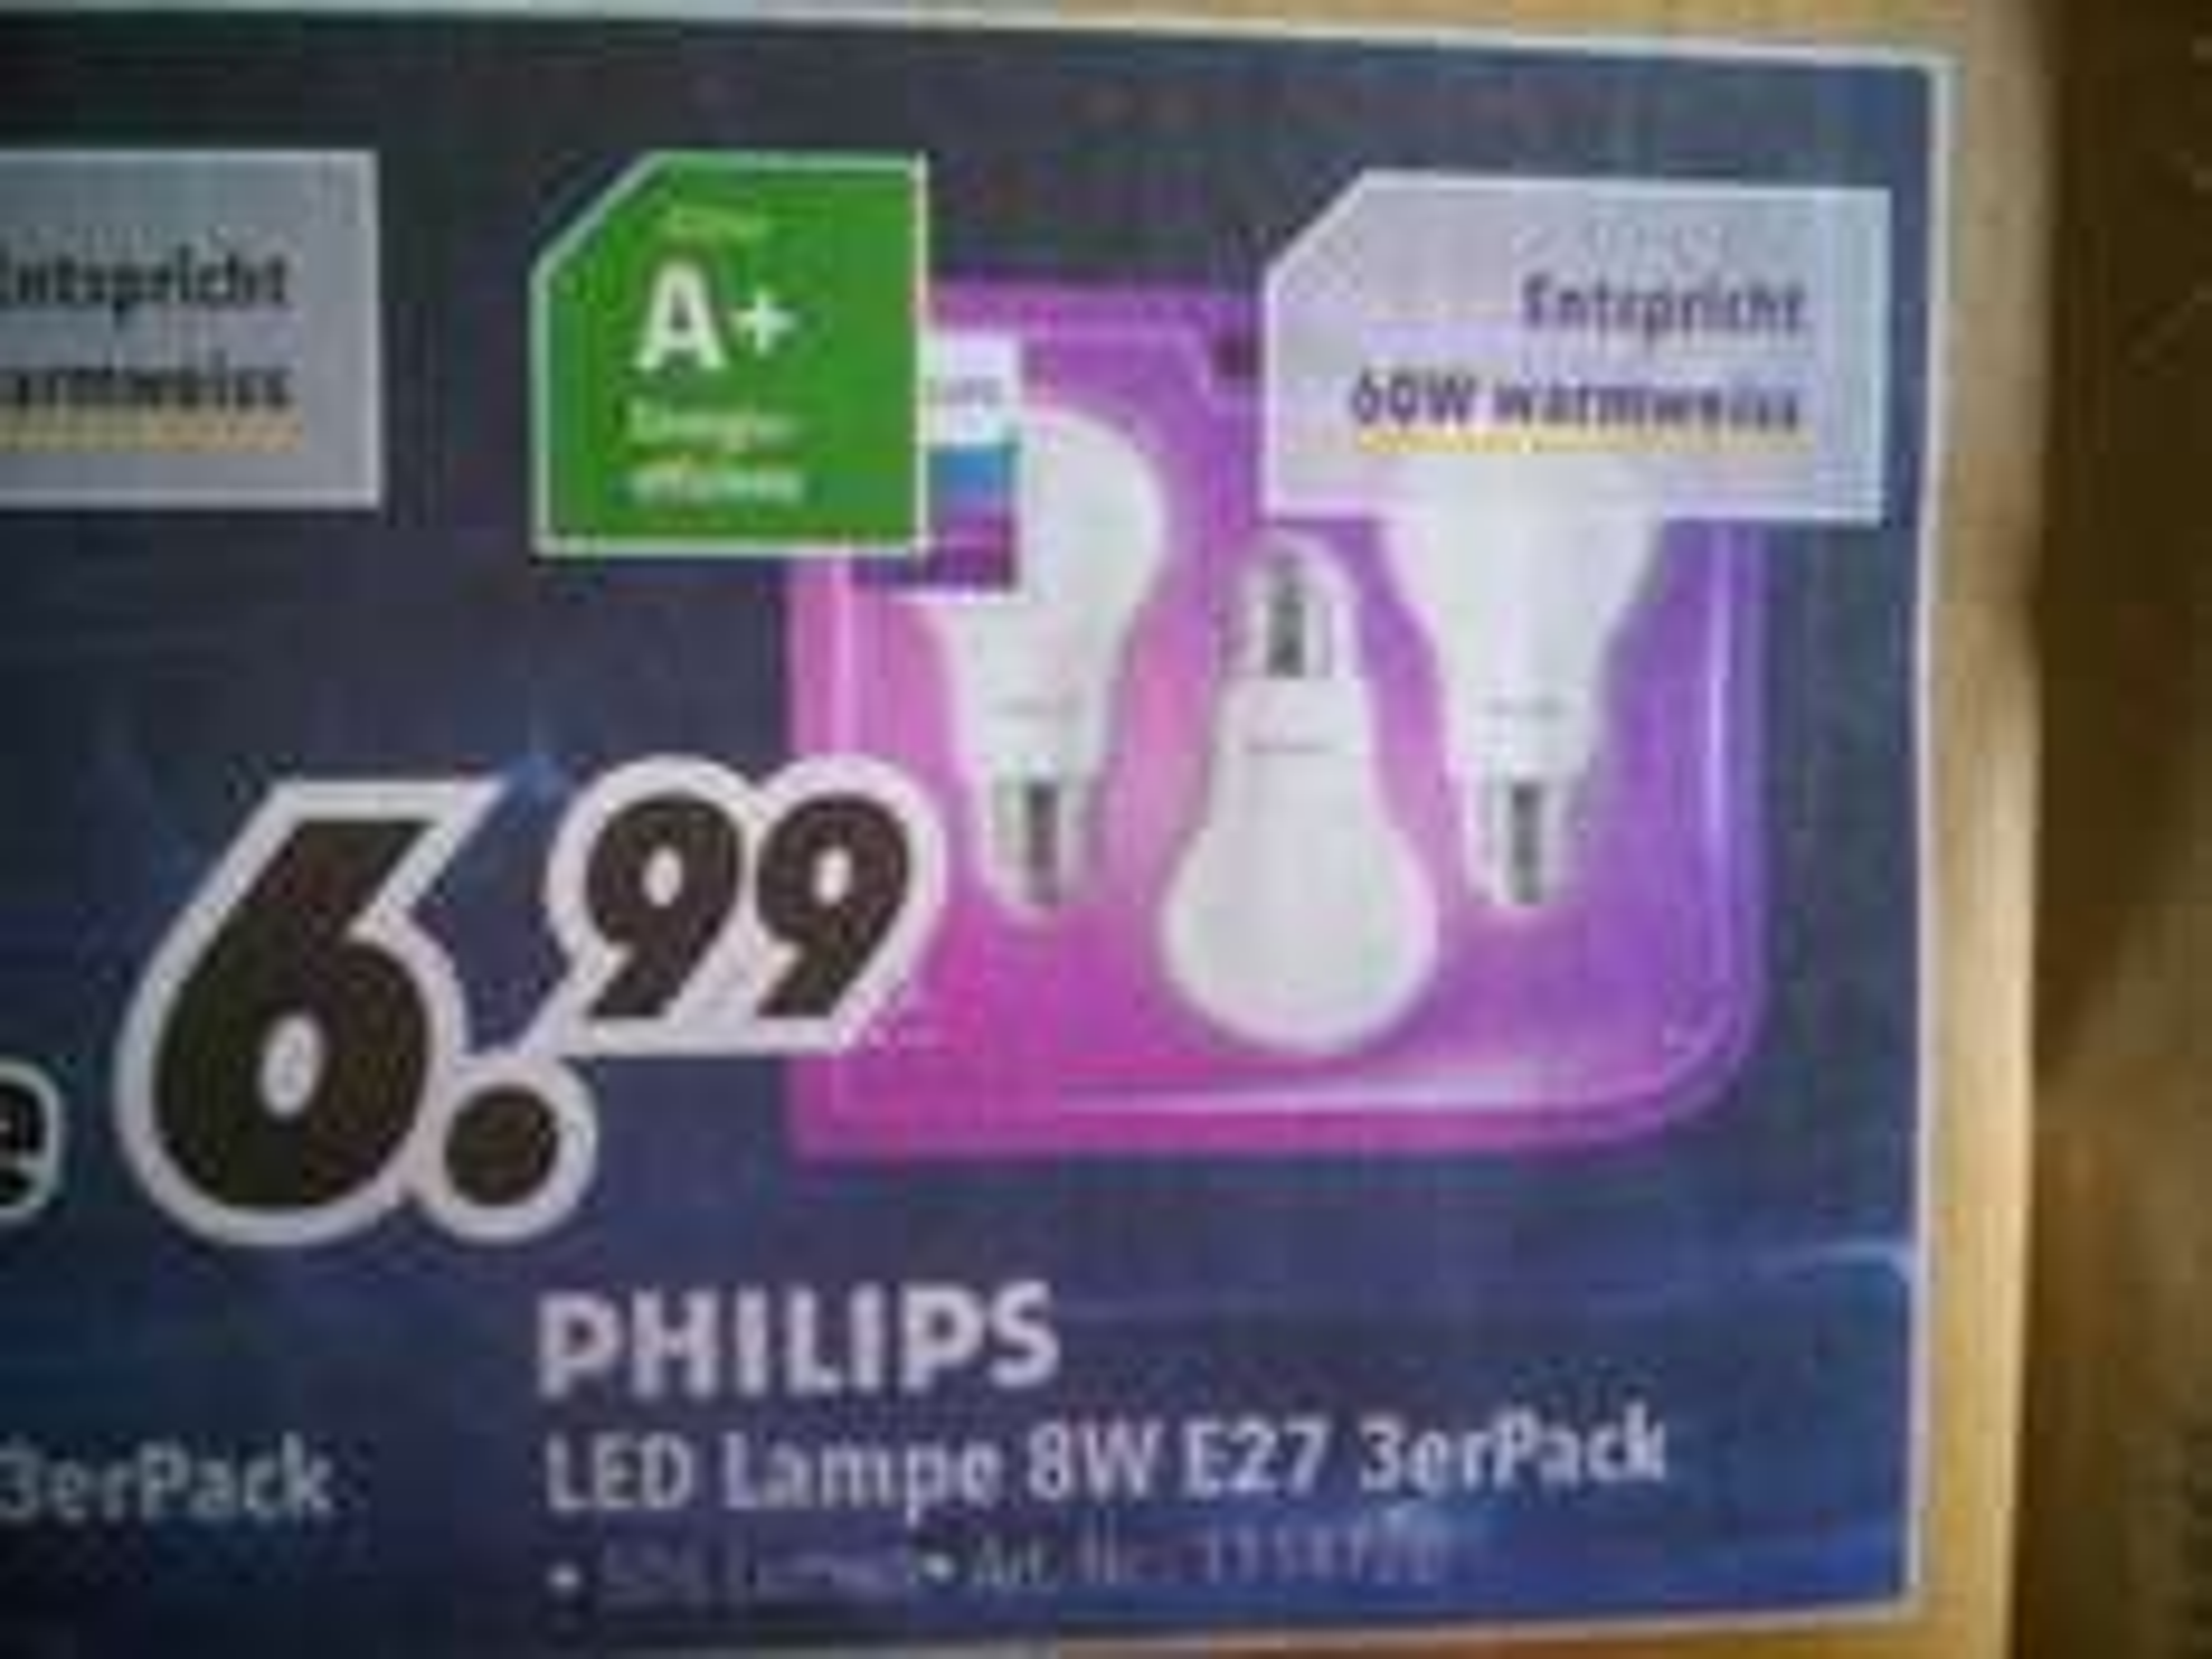 (Lokal) Medimax Philips LED Lampe 8W E27 3erPack